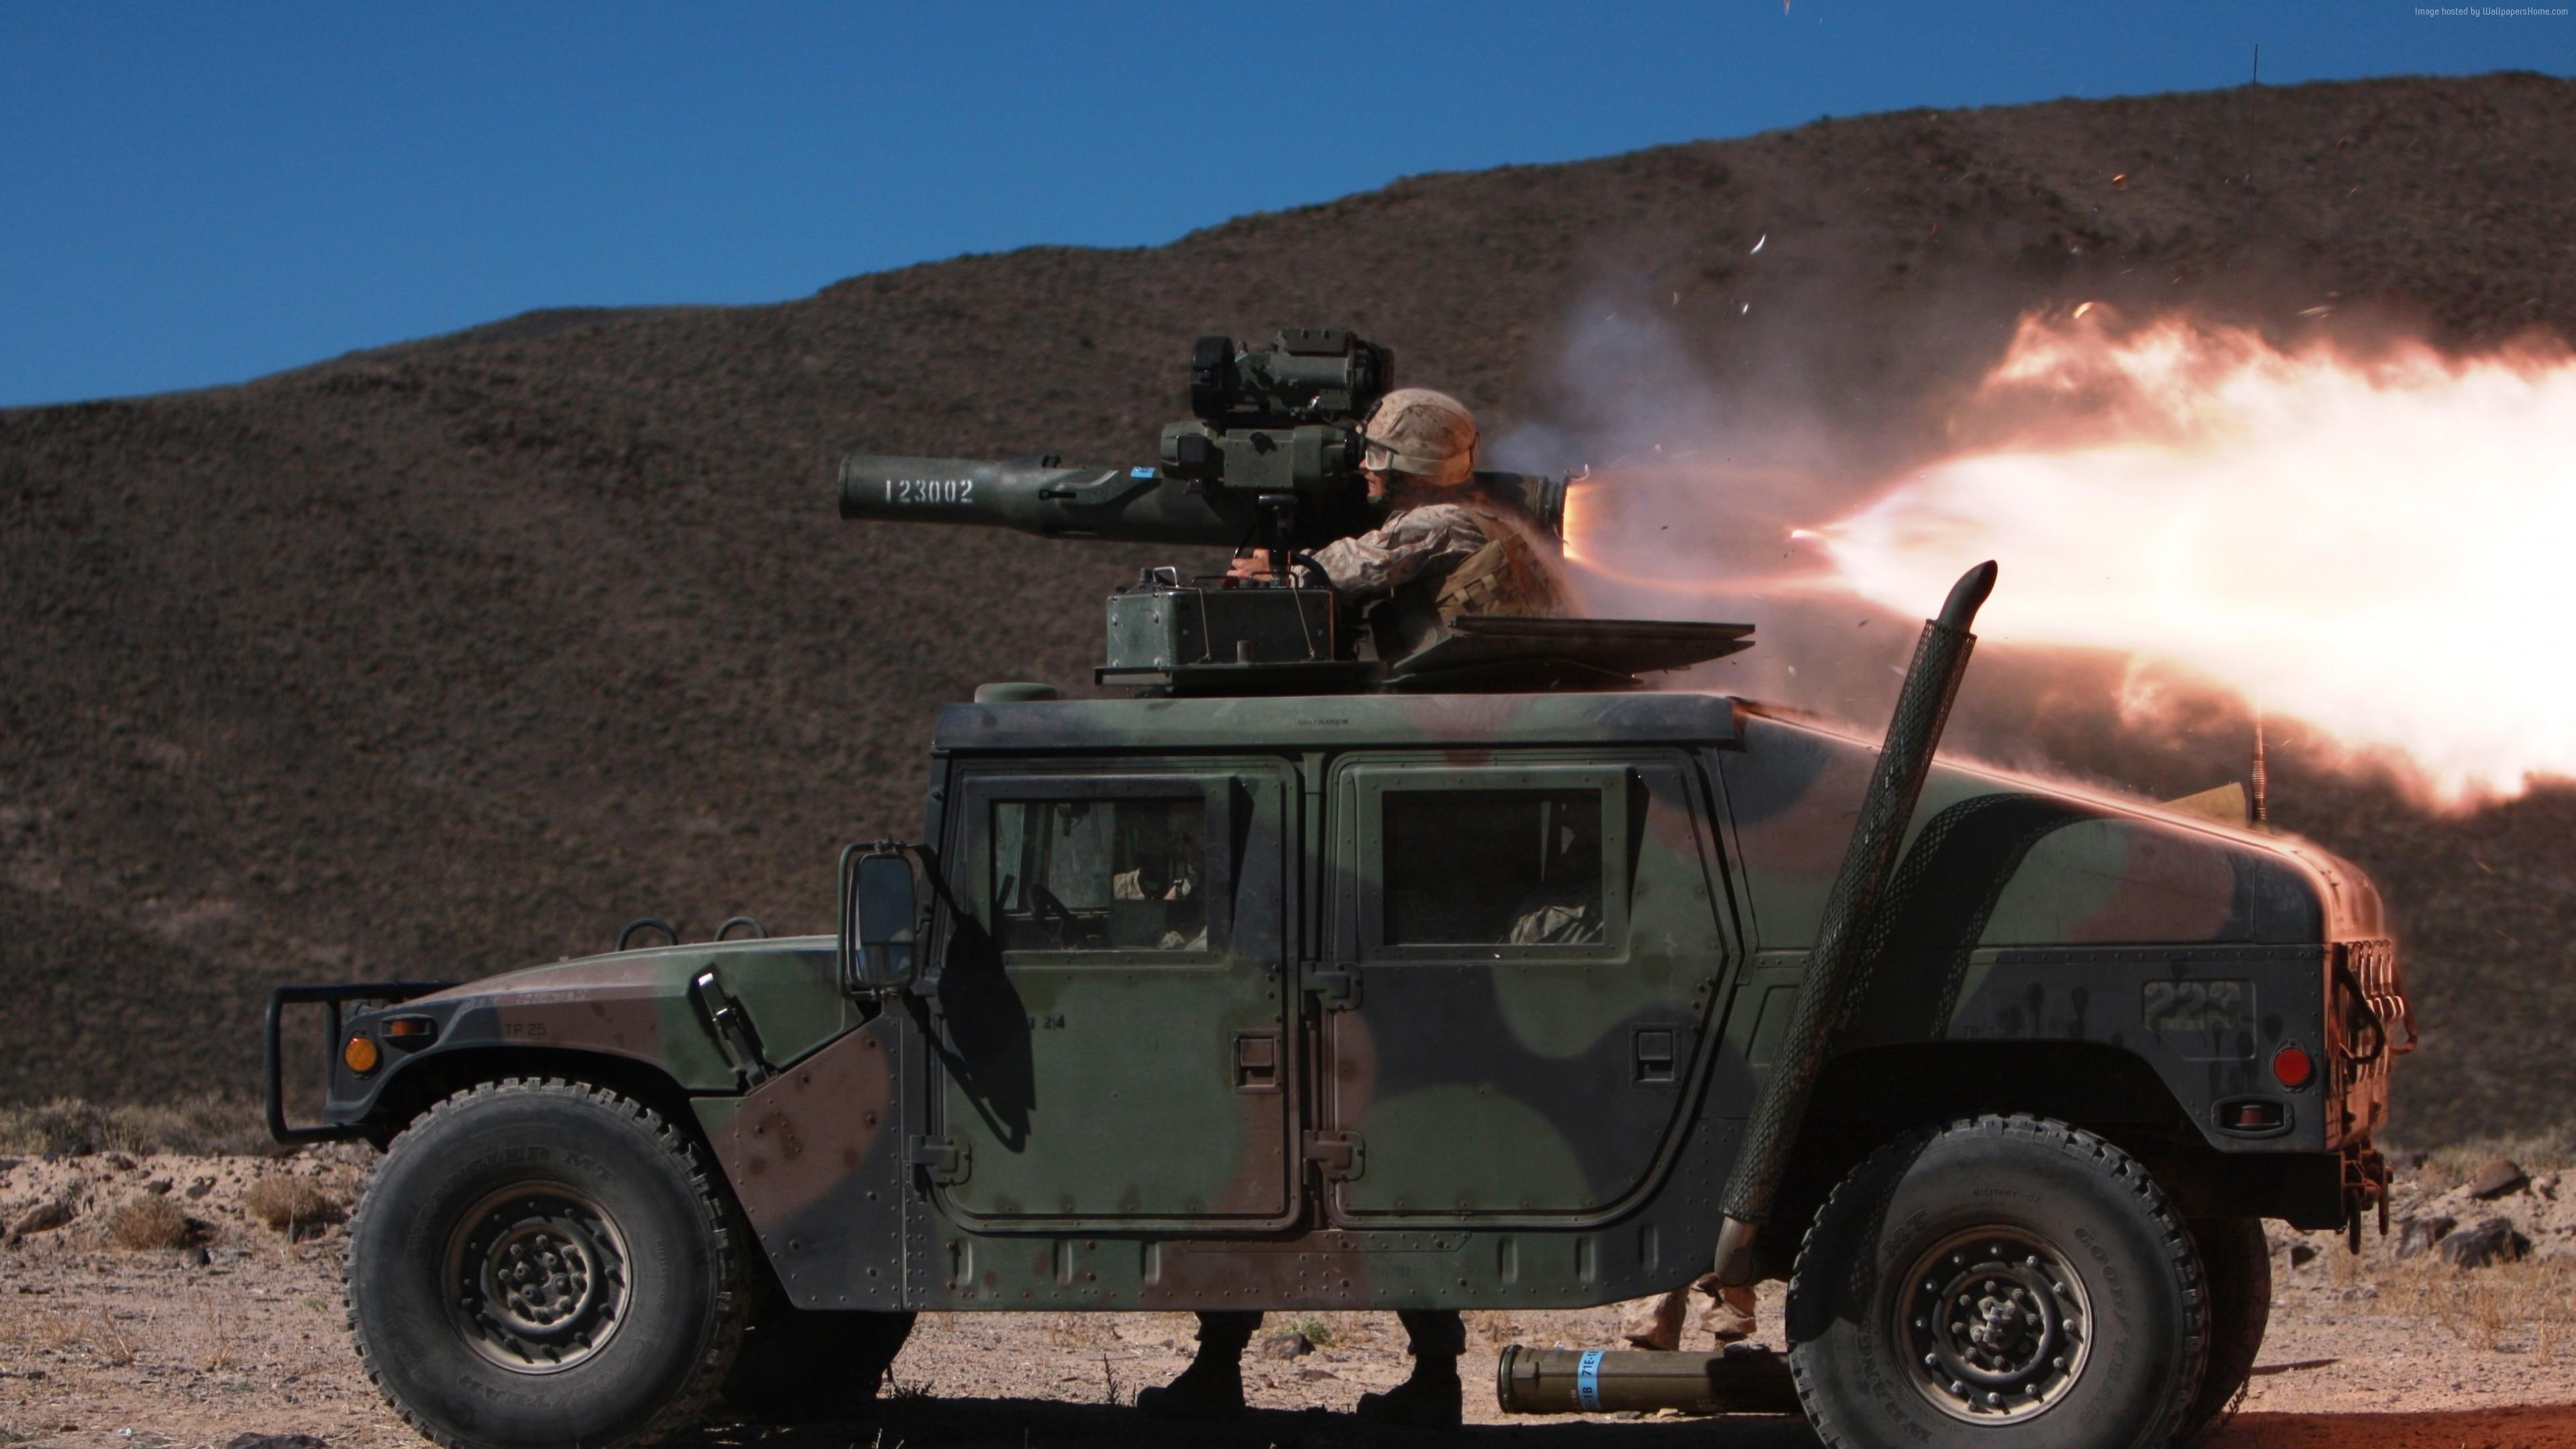 General 3840x2160 car bazookas soldier war missiles HMMWV USMC